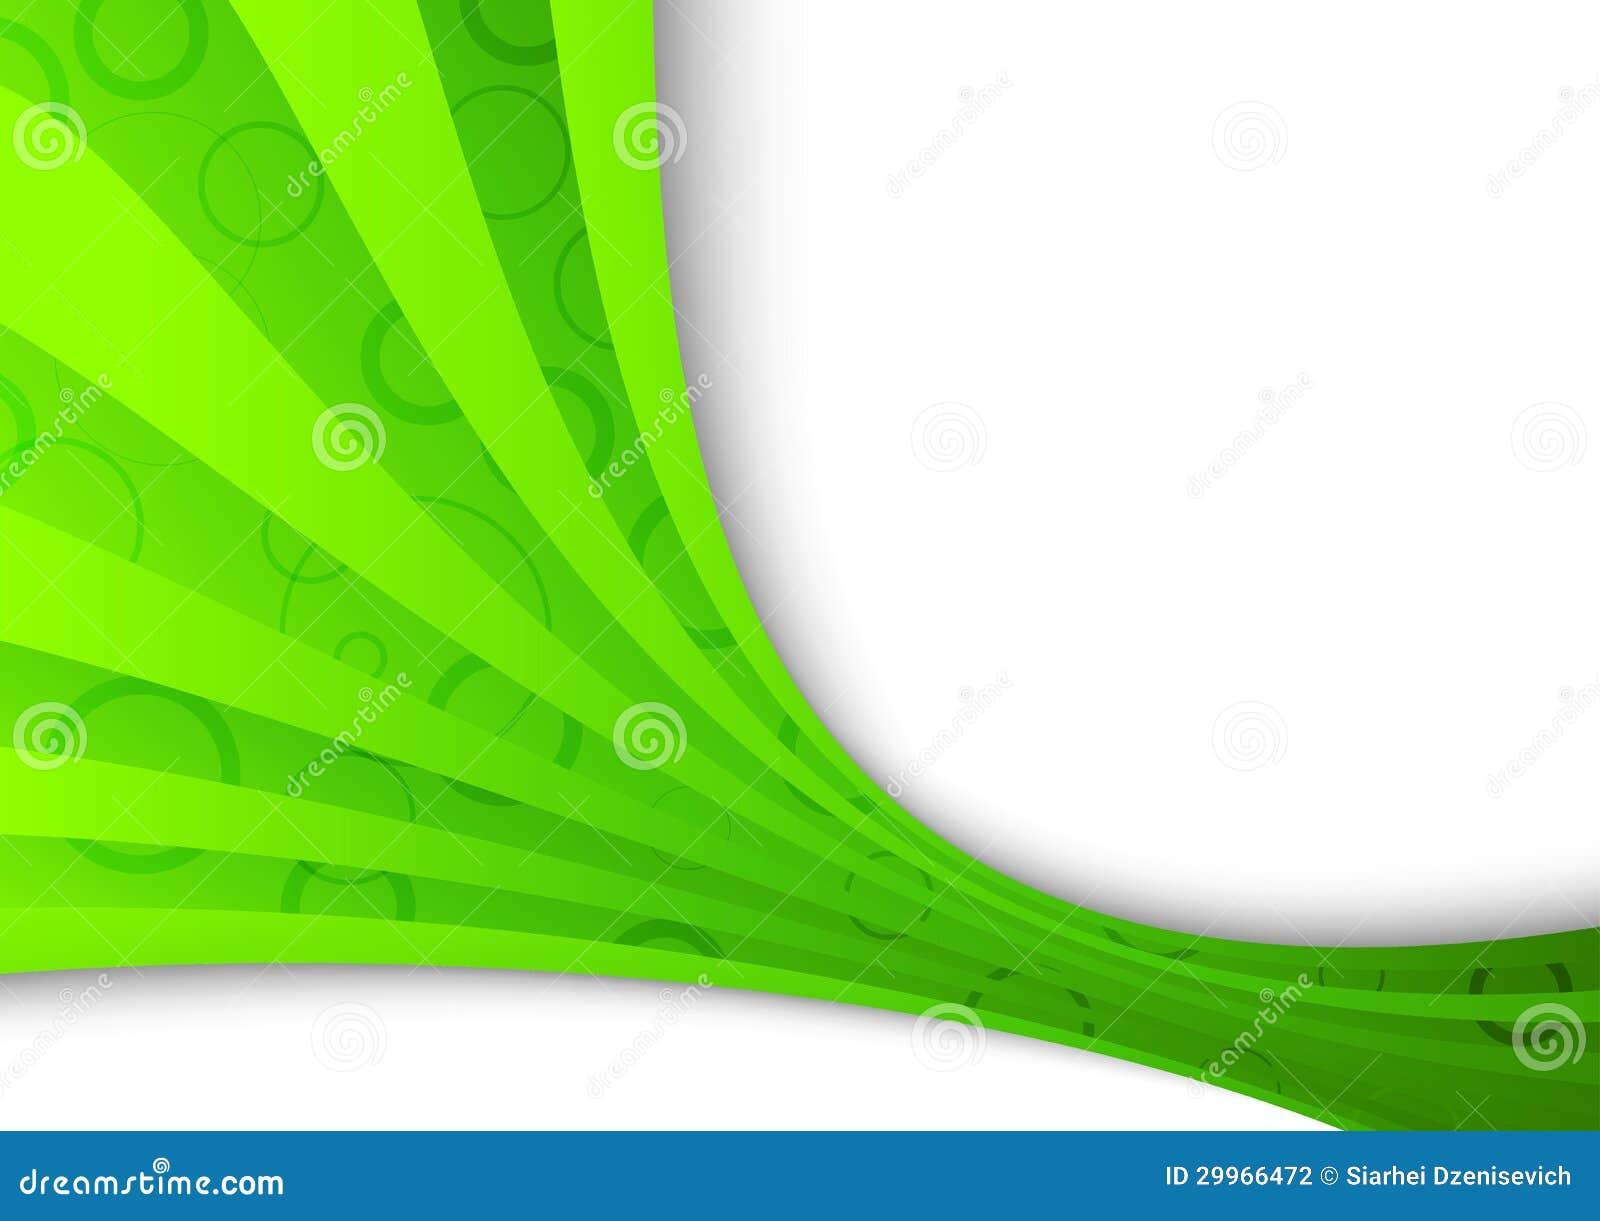 green wave clip art - photo #4